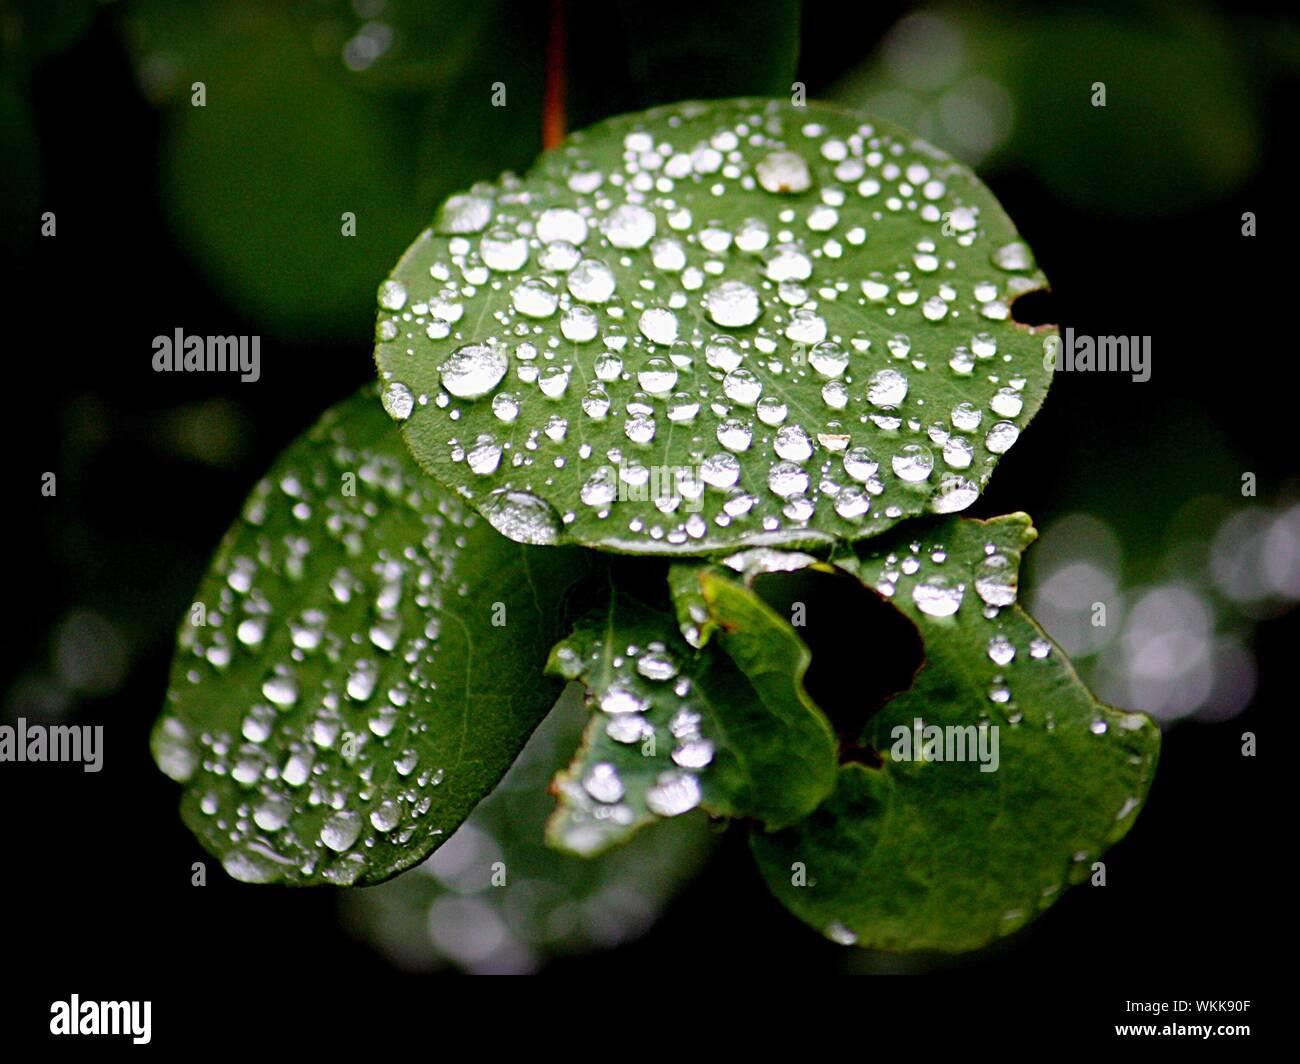 Close-up Of Raindrops On Leaf Stock Photo